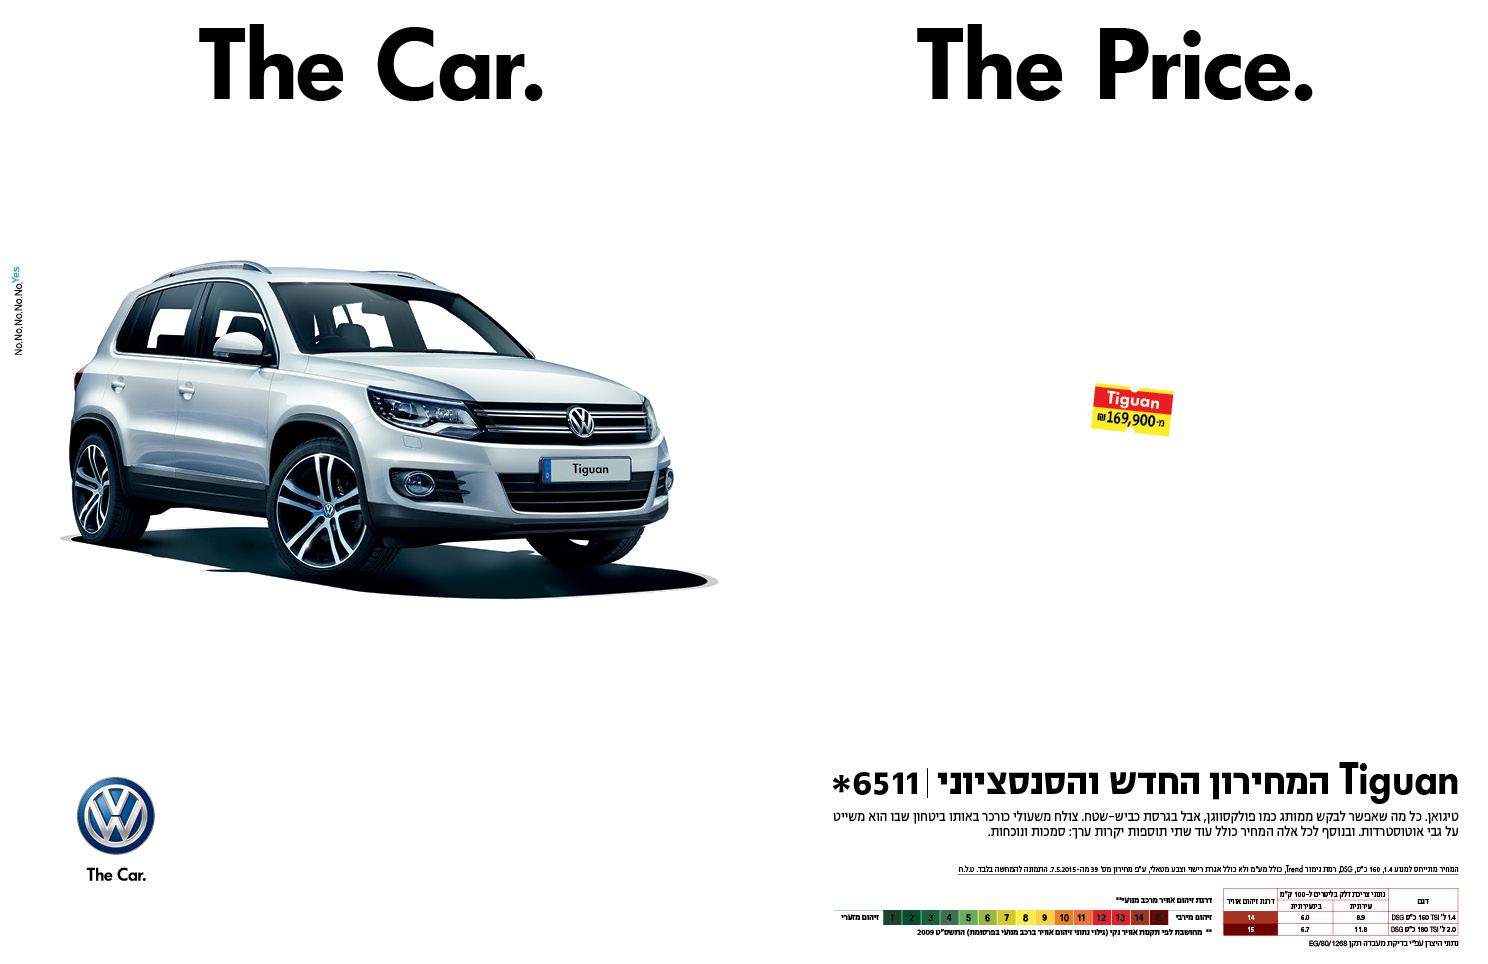 vw israel the car the price no no no no no yes